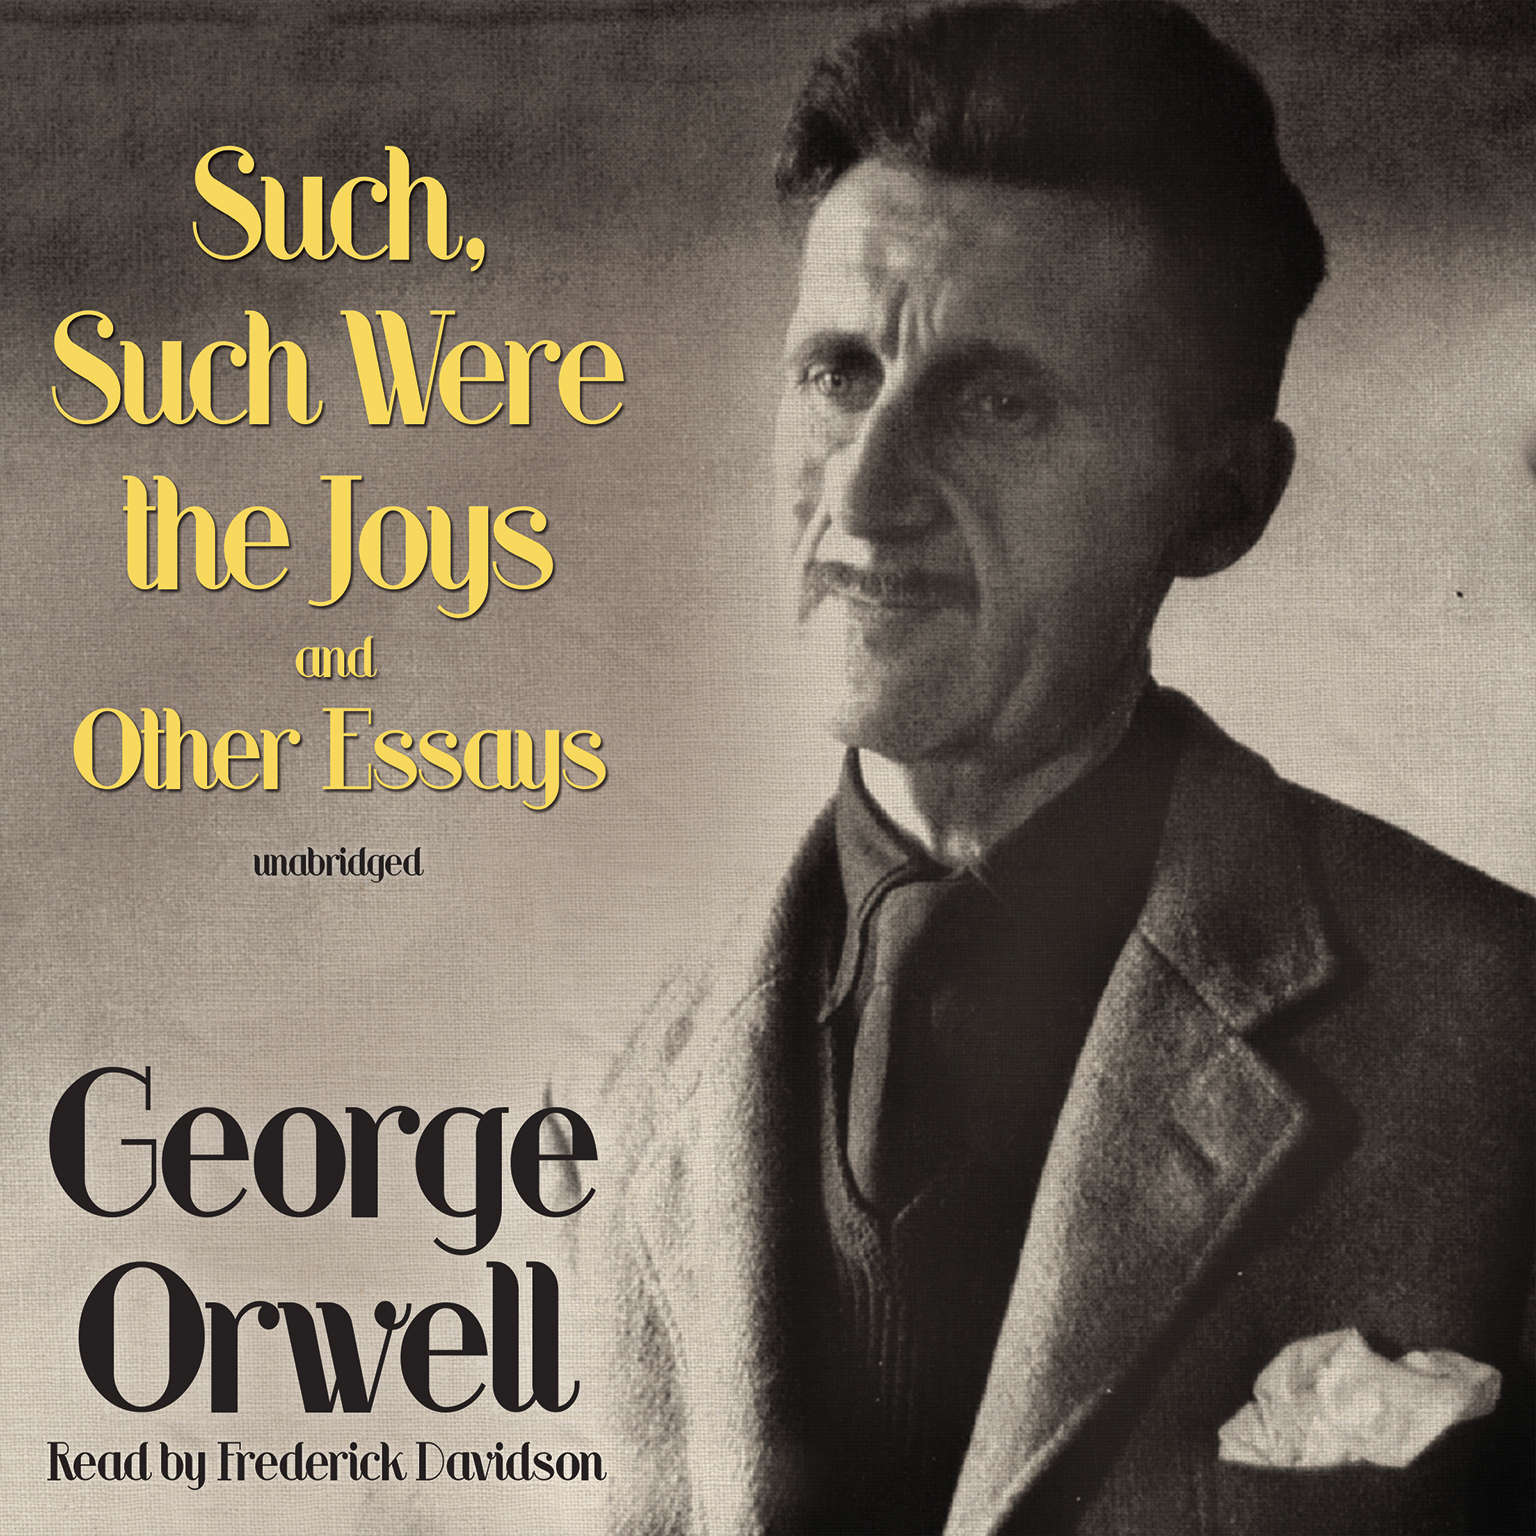 008 Square Essay Example George Orwell Frightening Essays Everyman's Library Summary Bookshop Memories Full